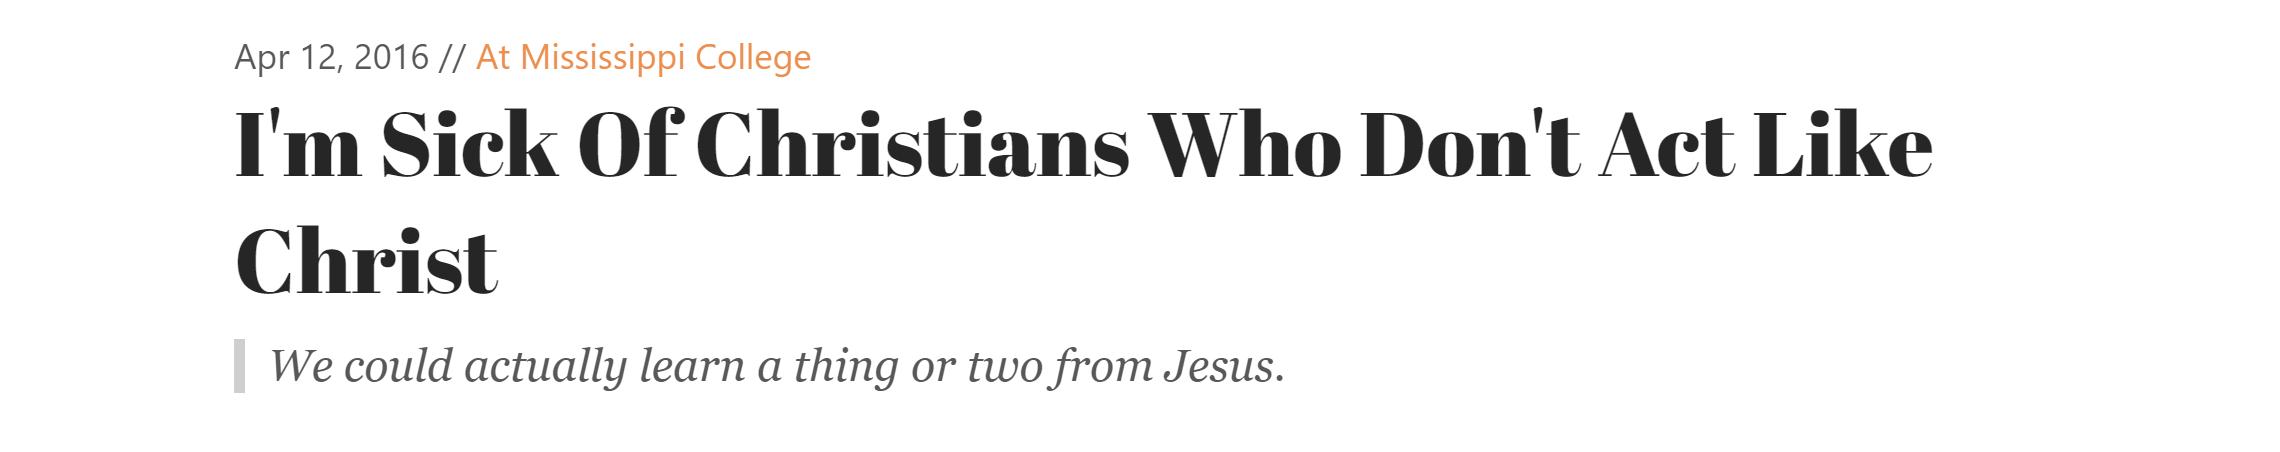 christlike headline6.png